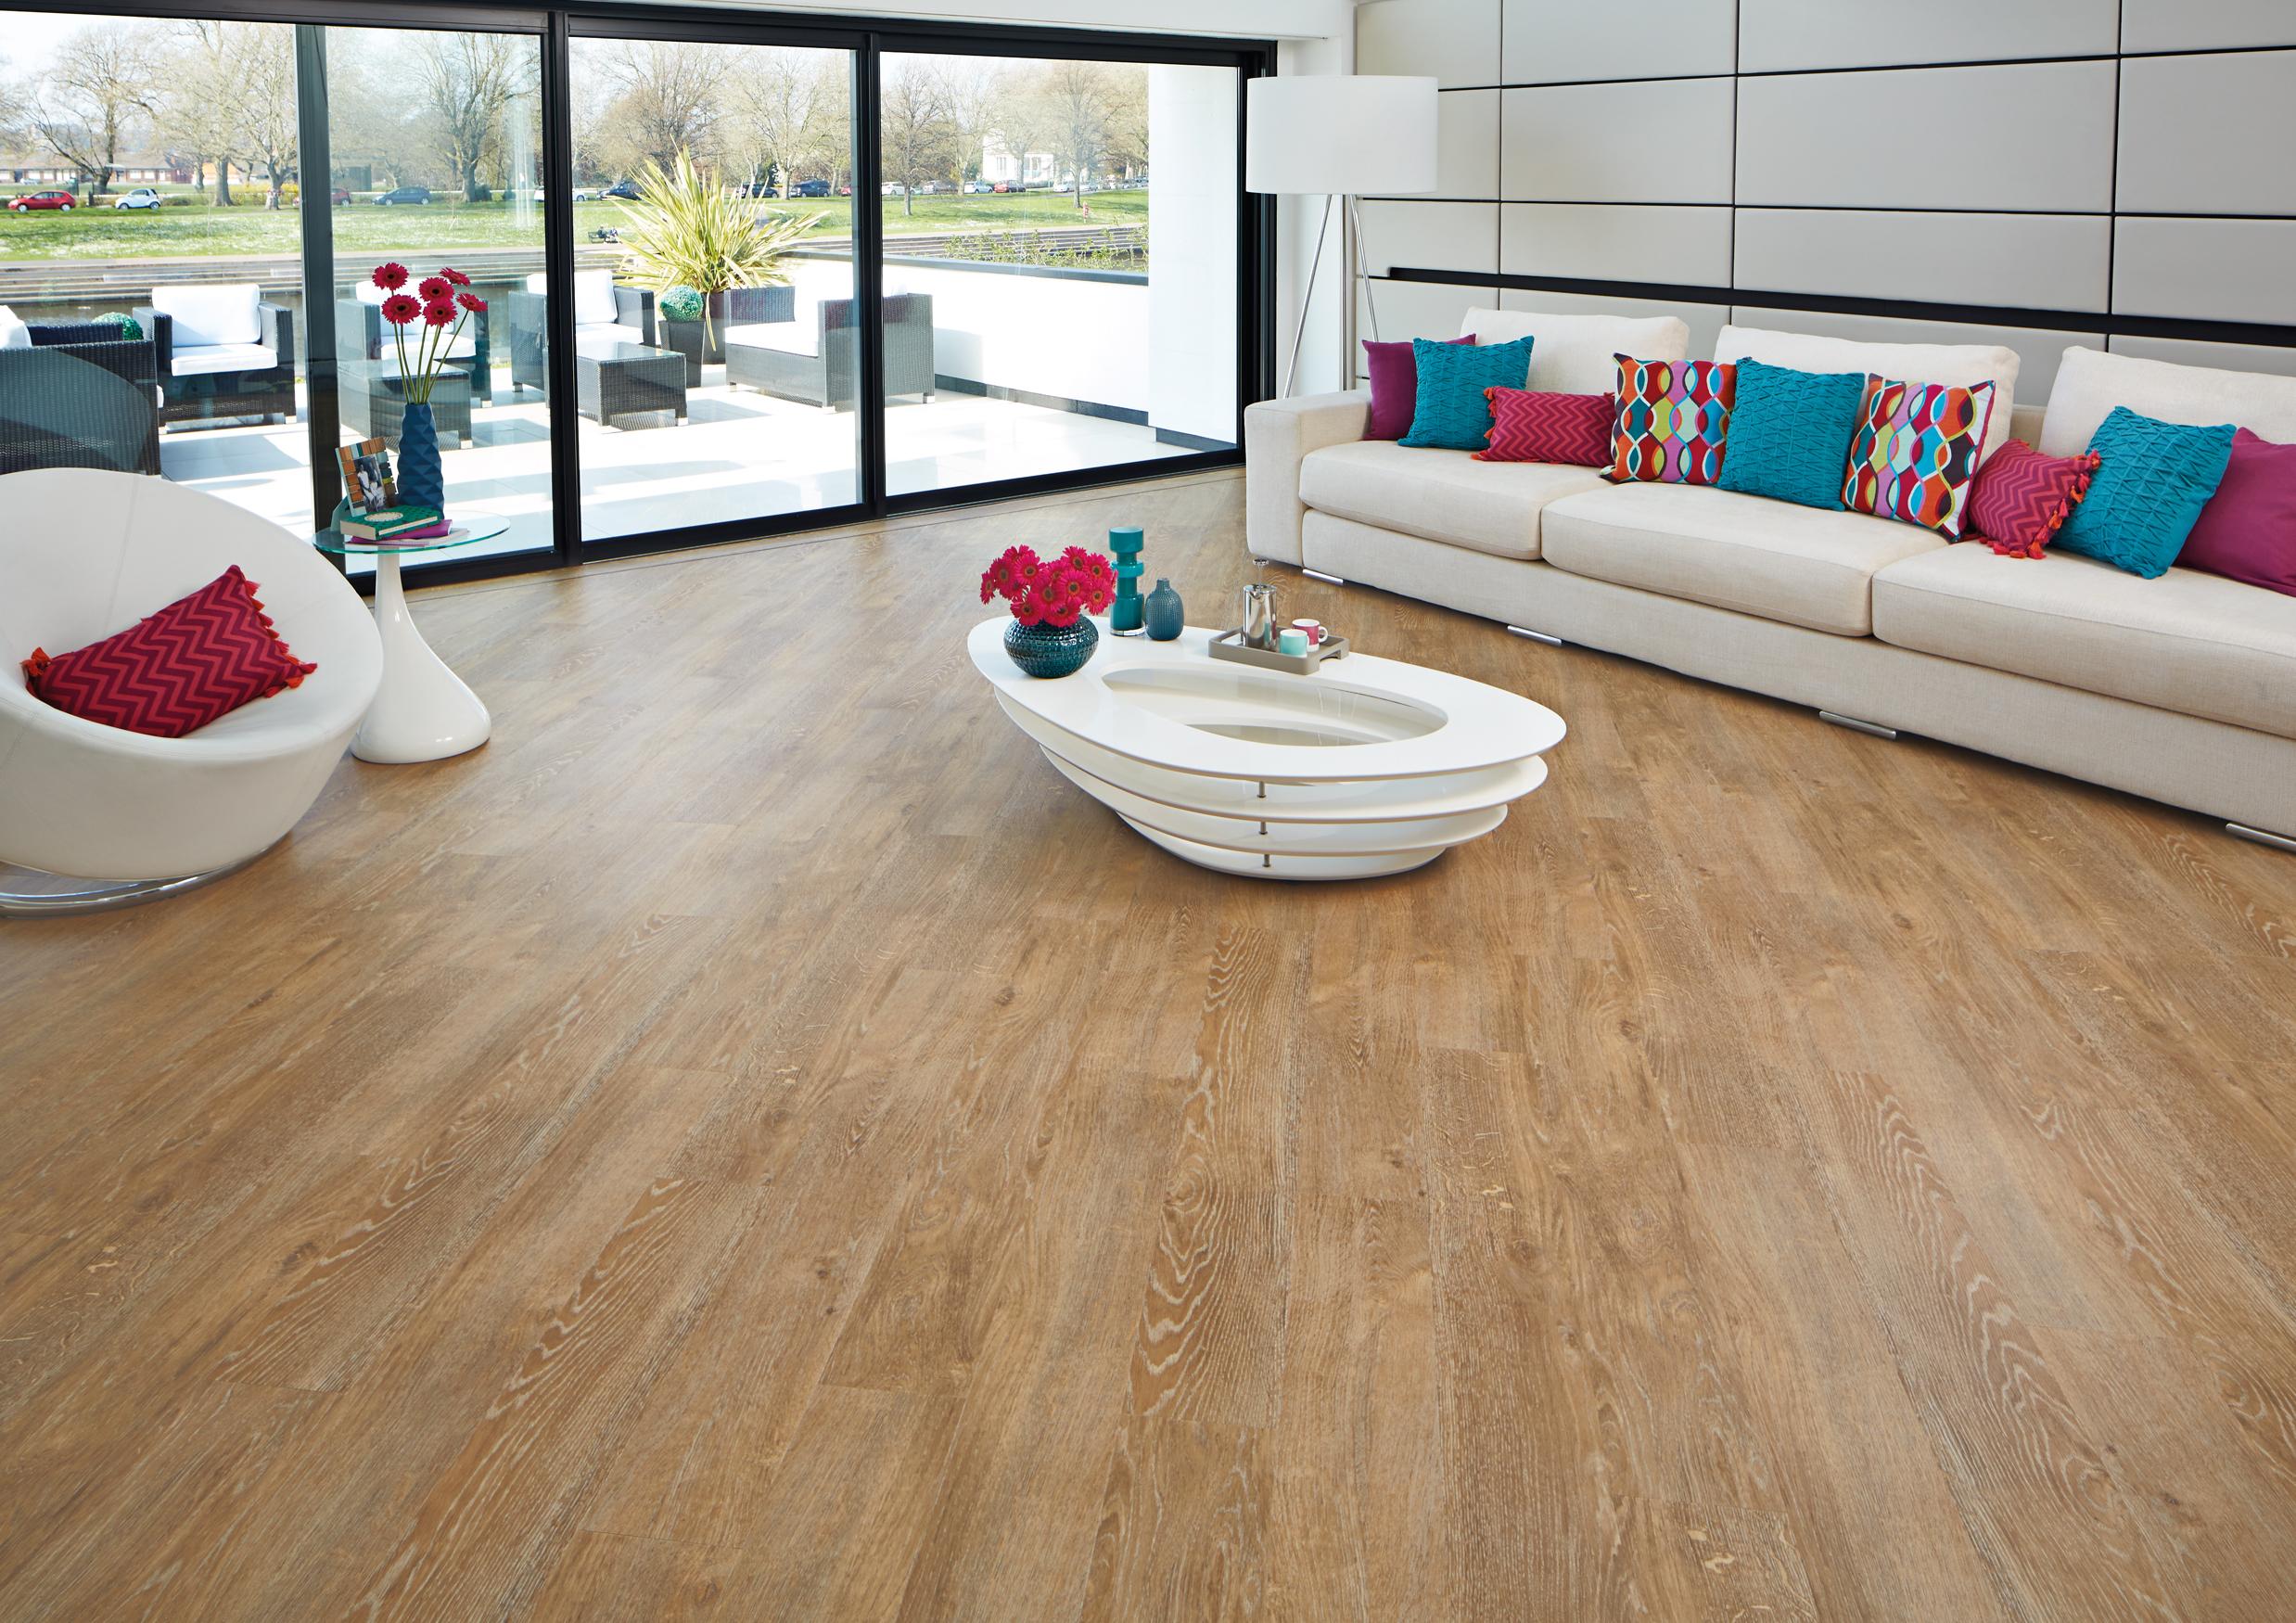 karndean flooring flooringoak pinterest oak pin search traditional floor amtico google livingroom